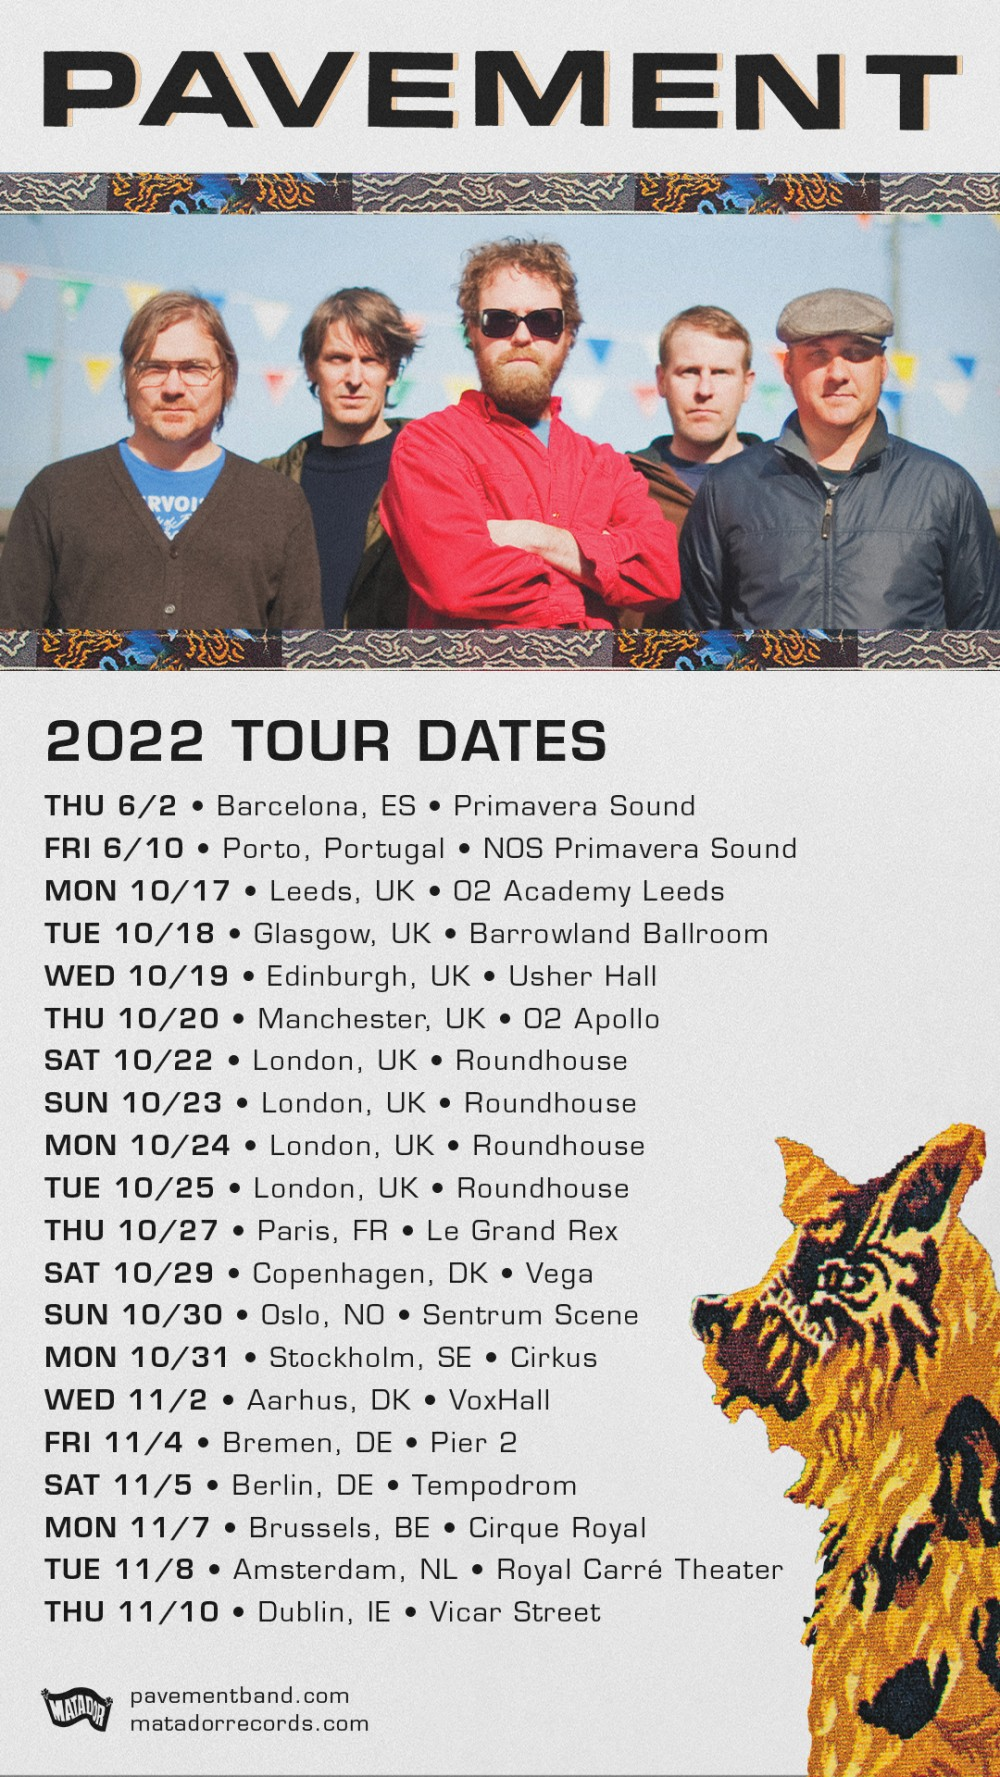 Pavement 2022 tour